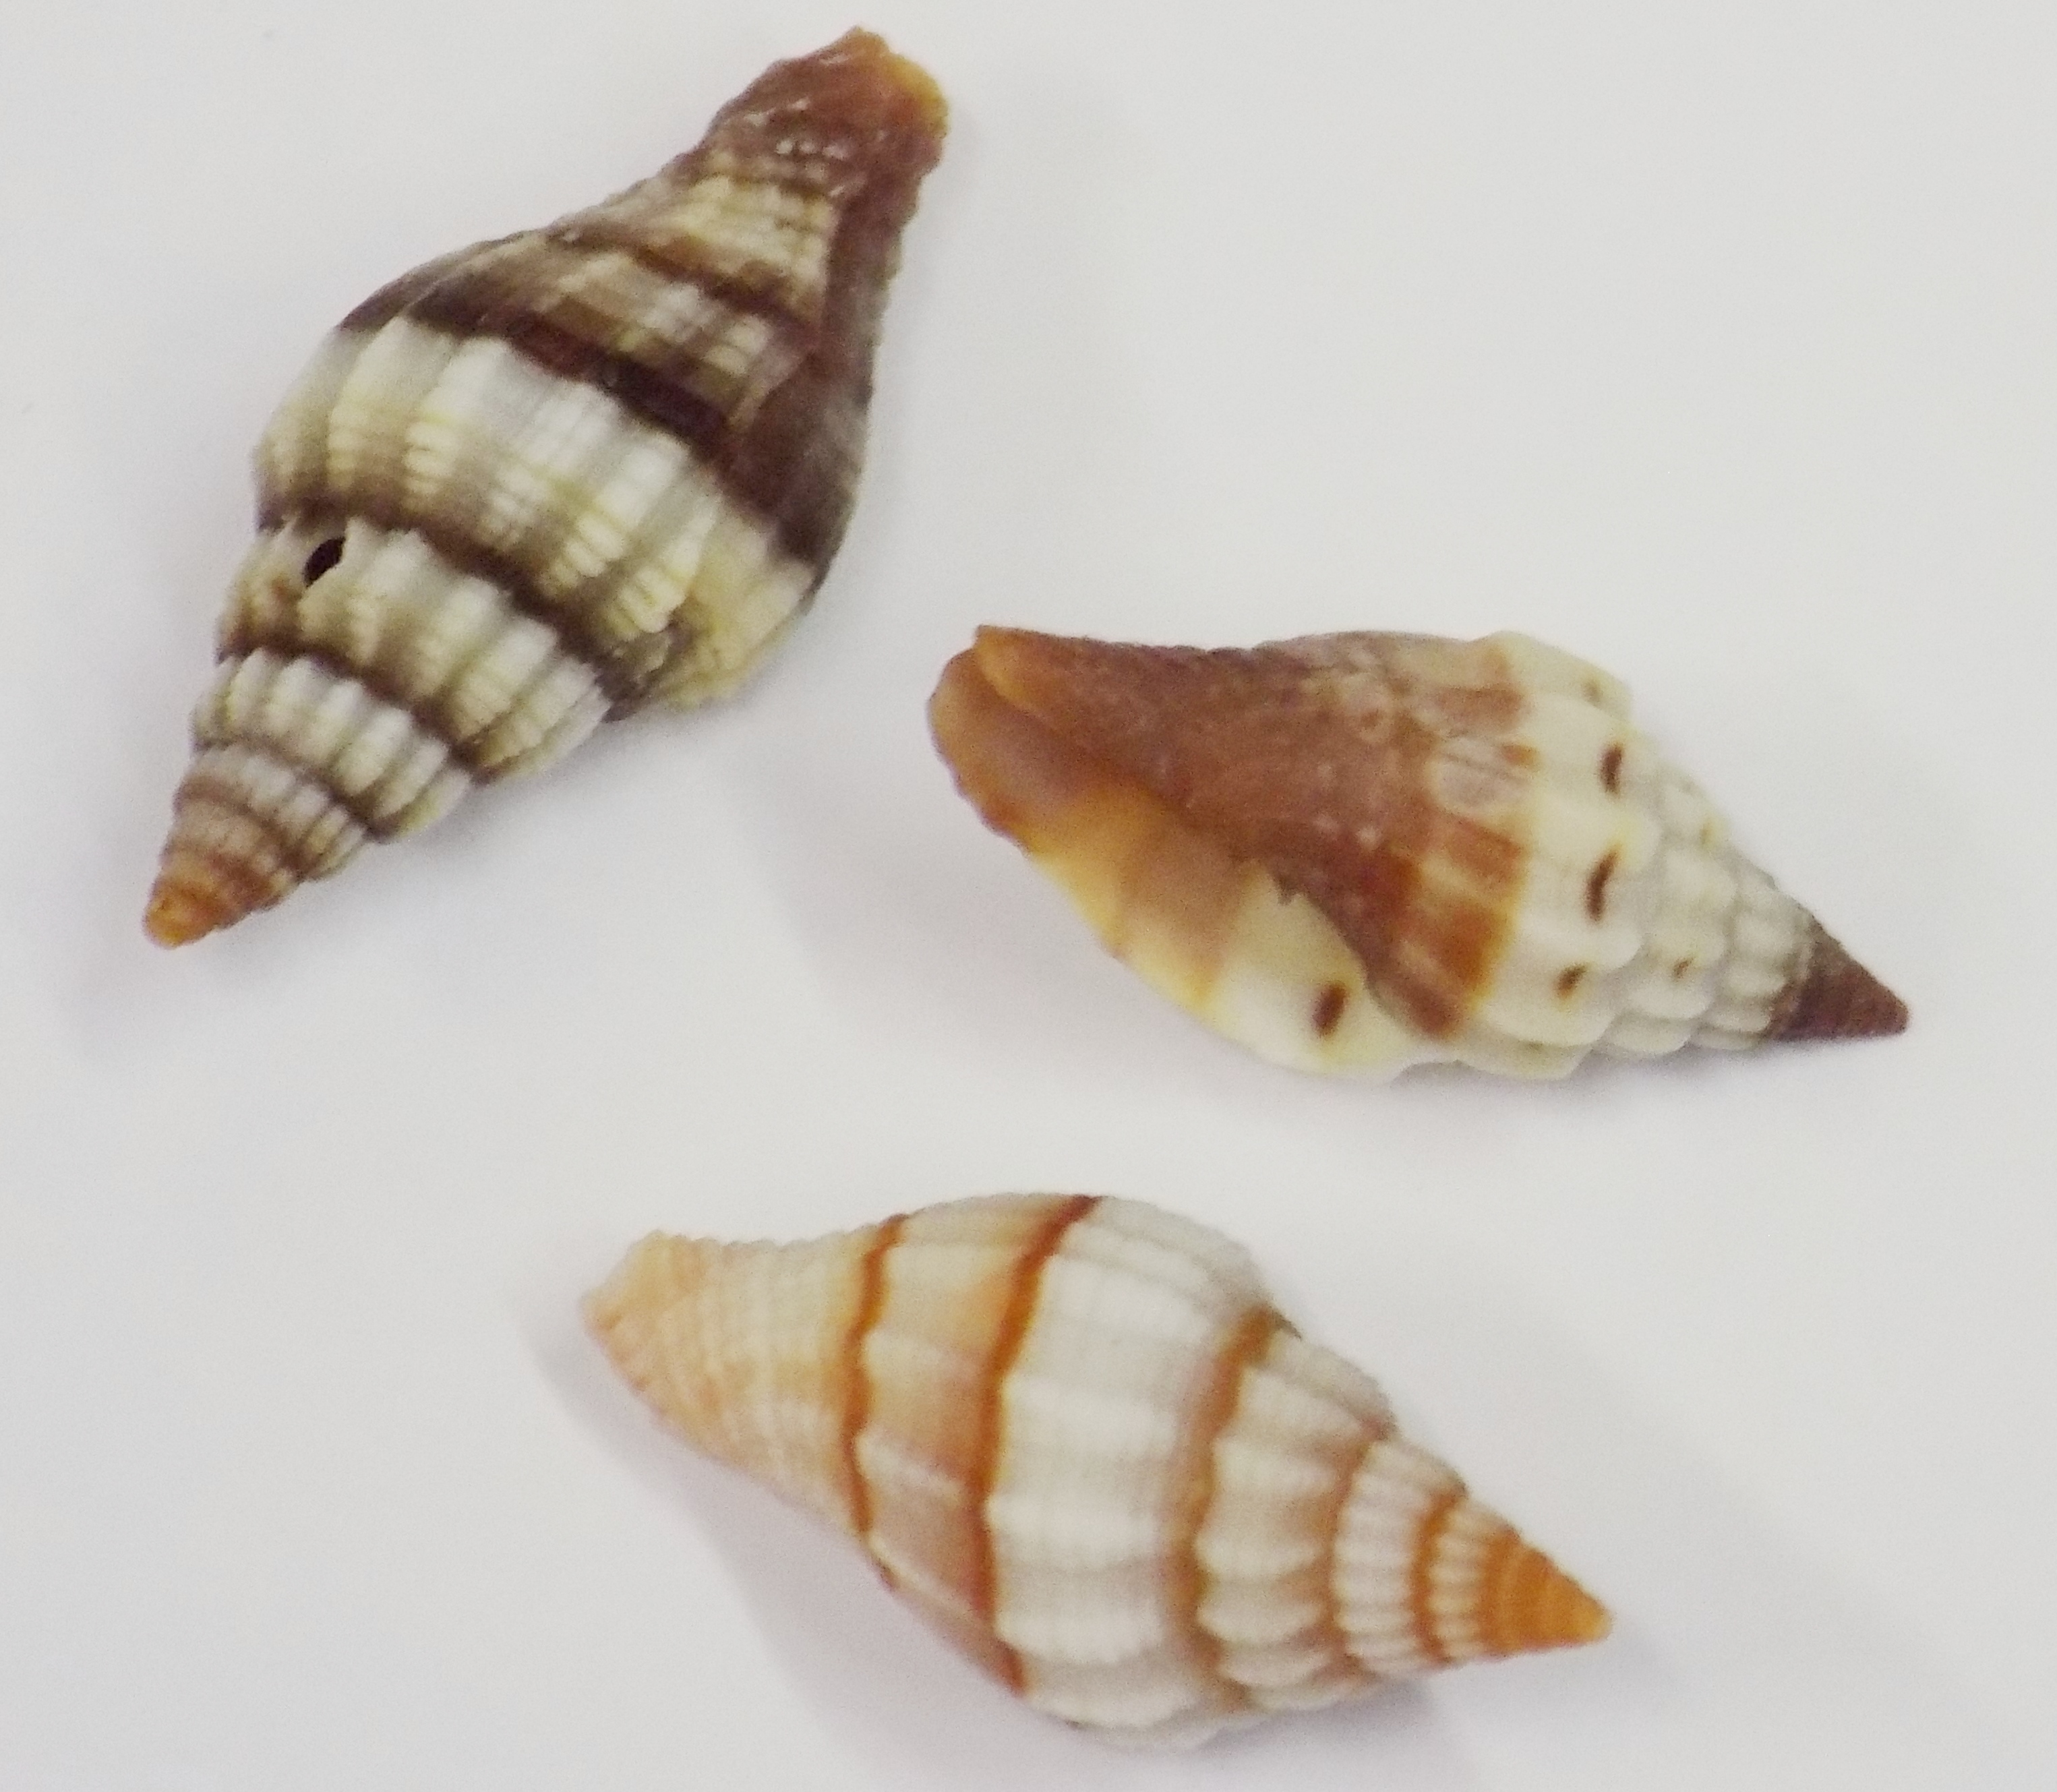 Plecarium stripe shell